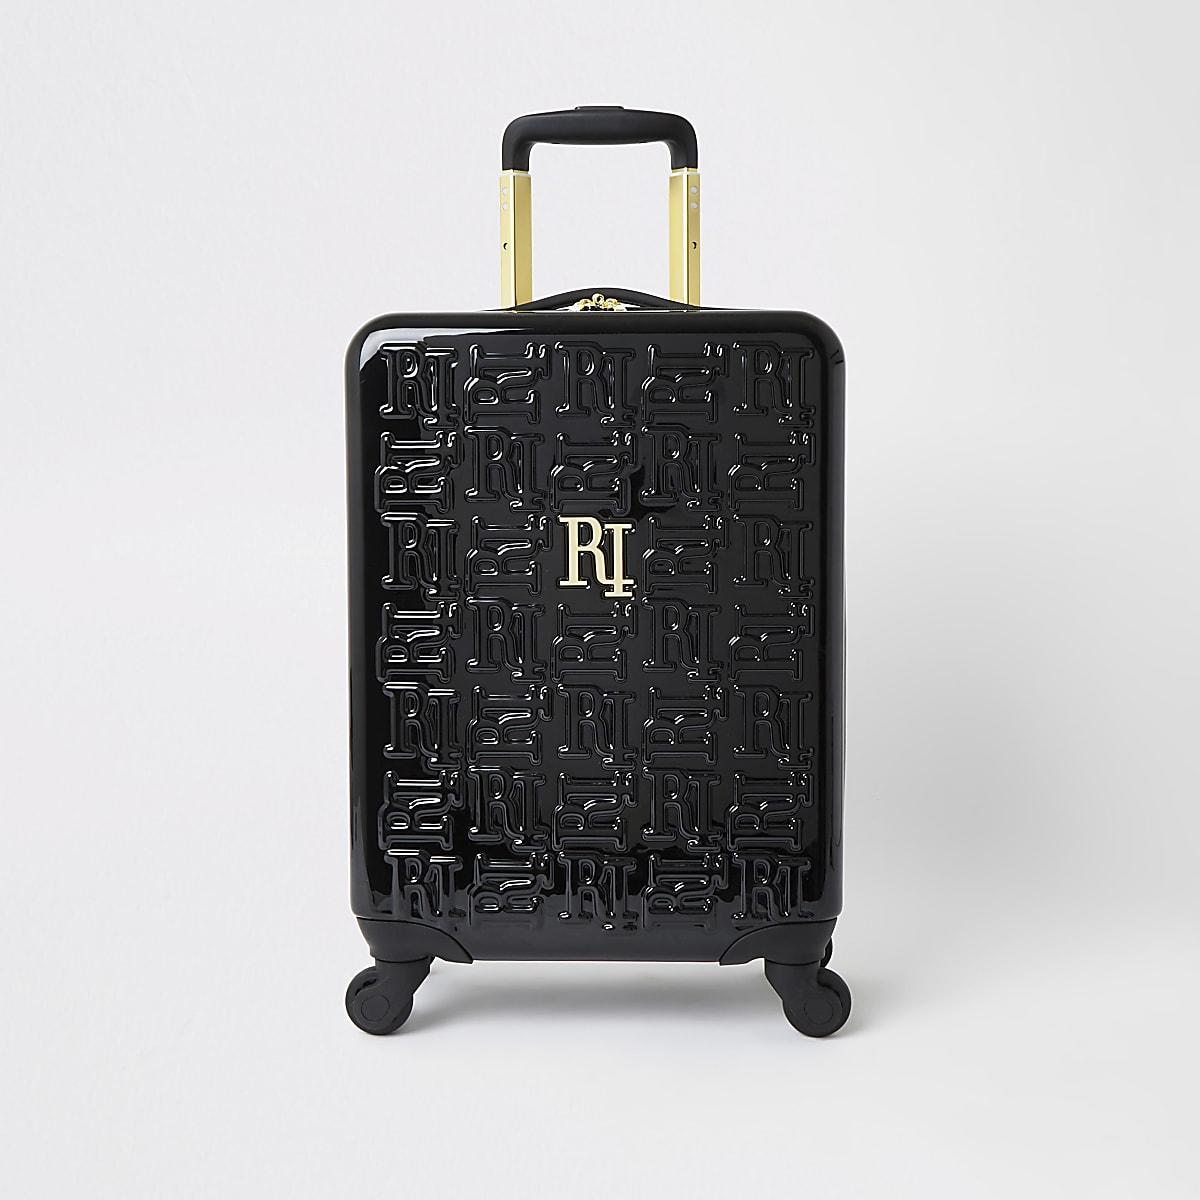 Zwarte koffer met RI-monogram